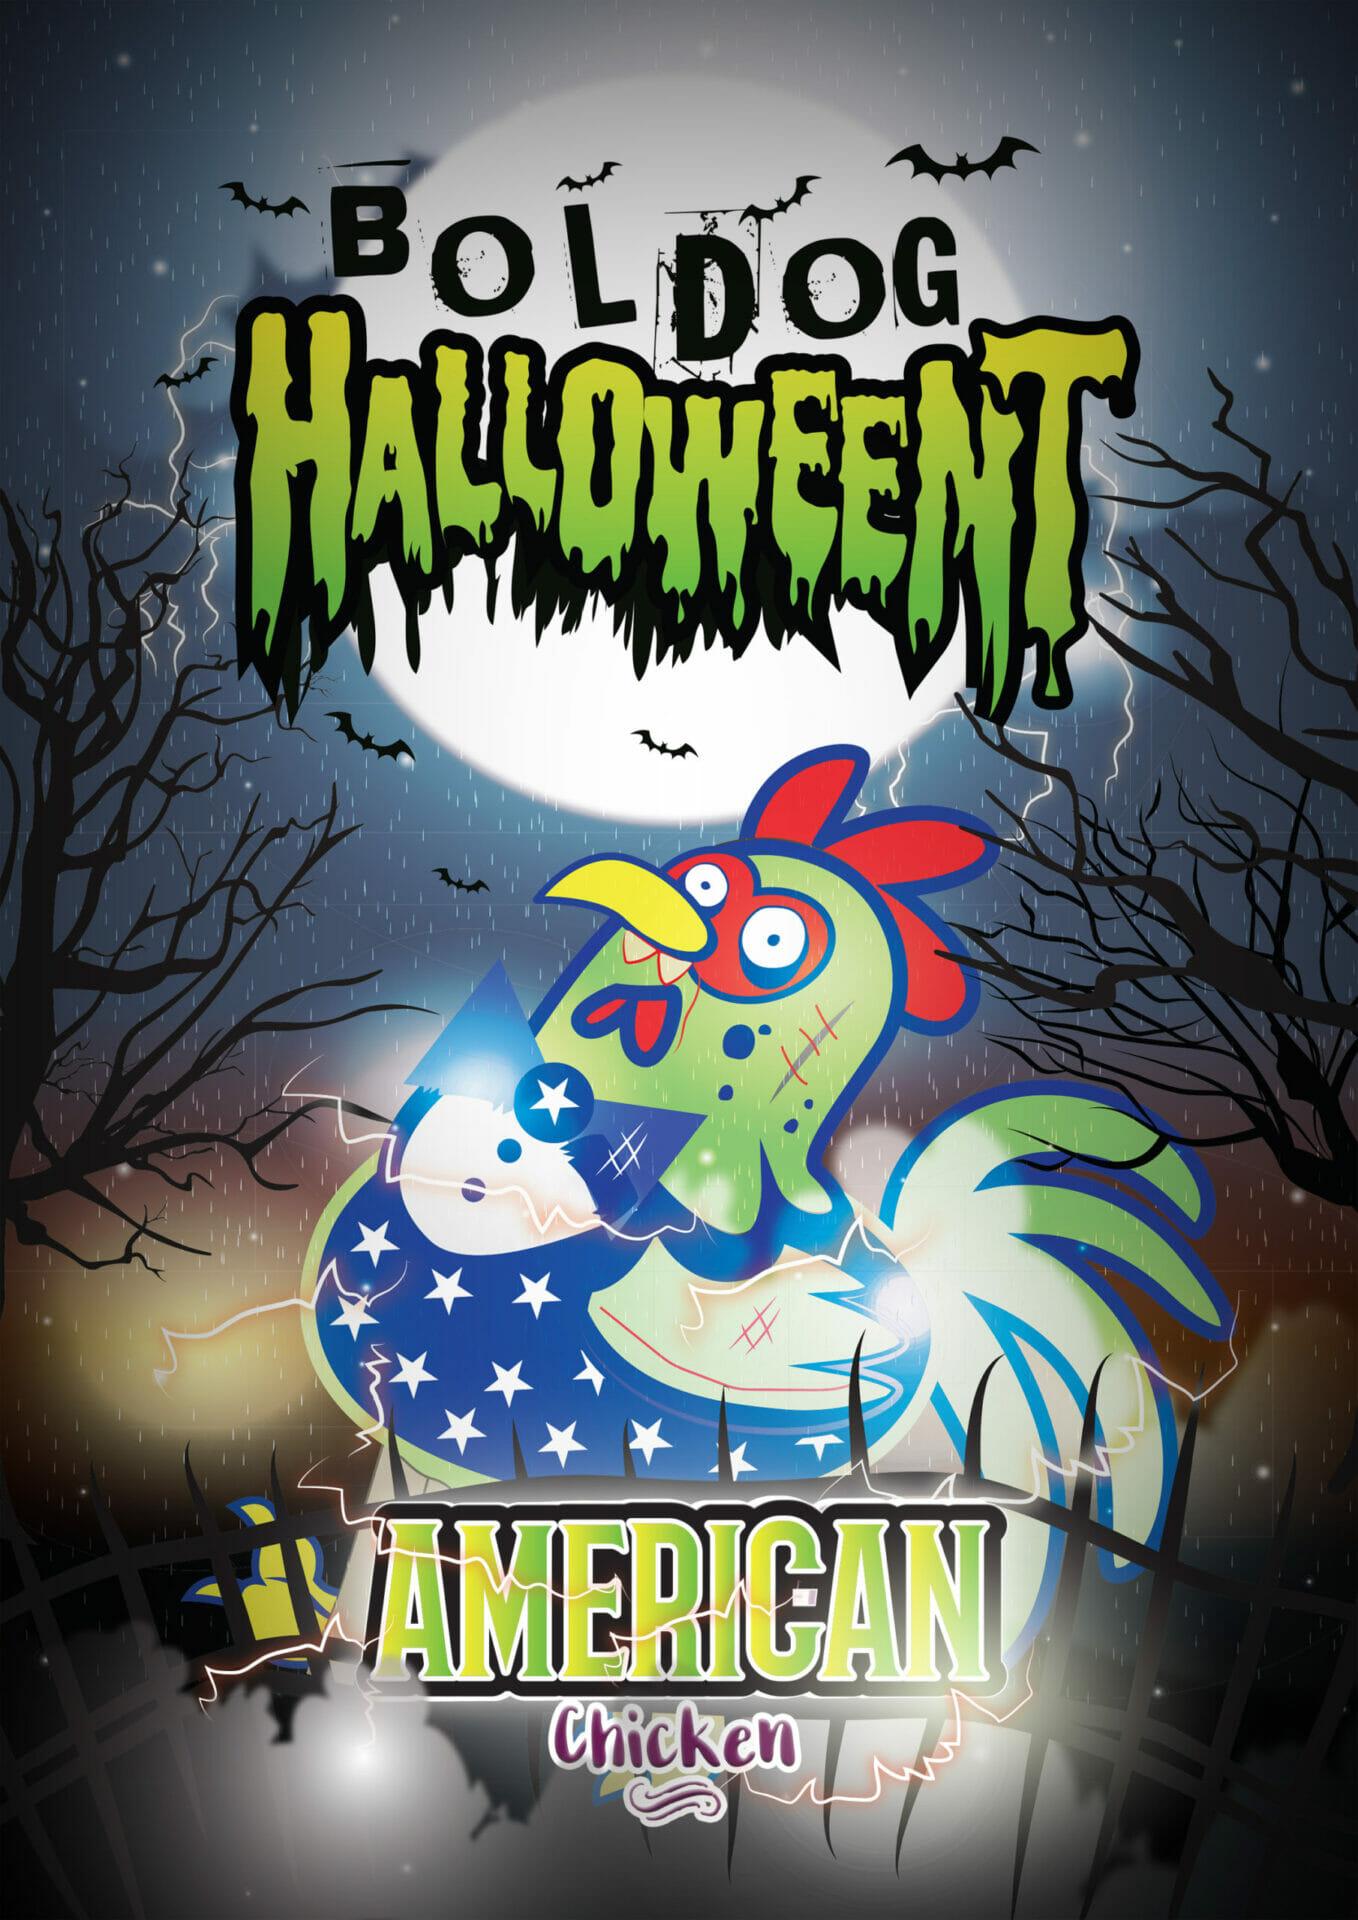 American_Chicken_Halloween_plakat_csirke